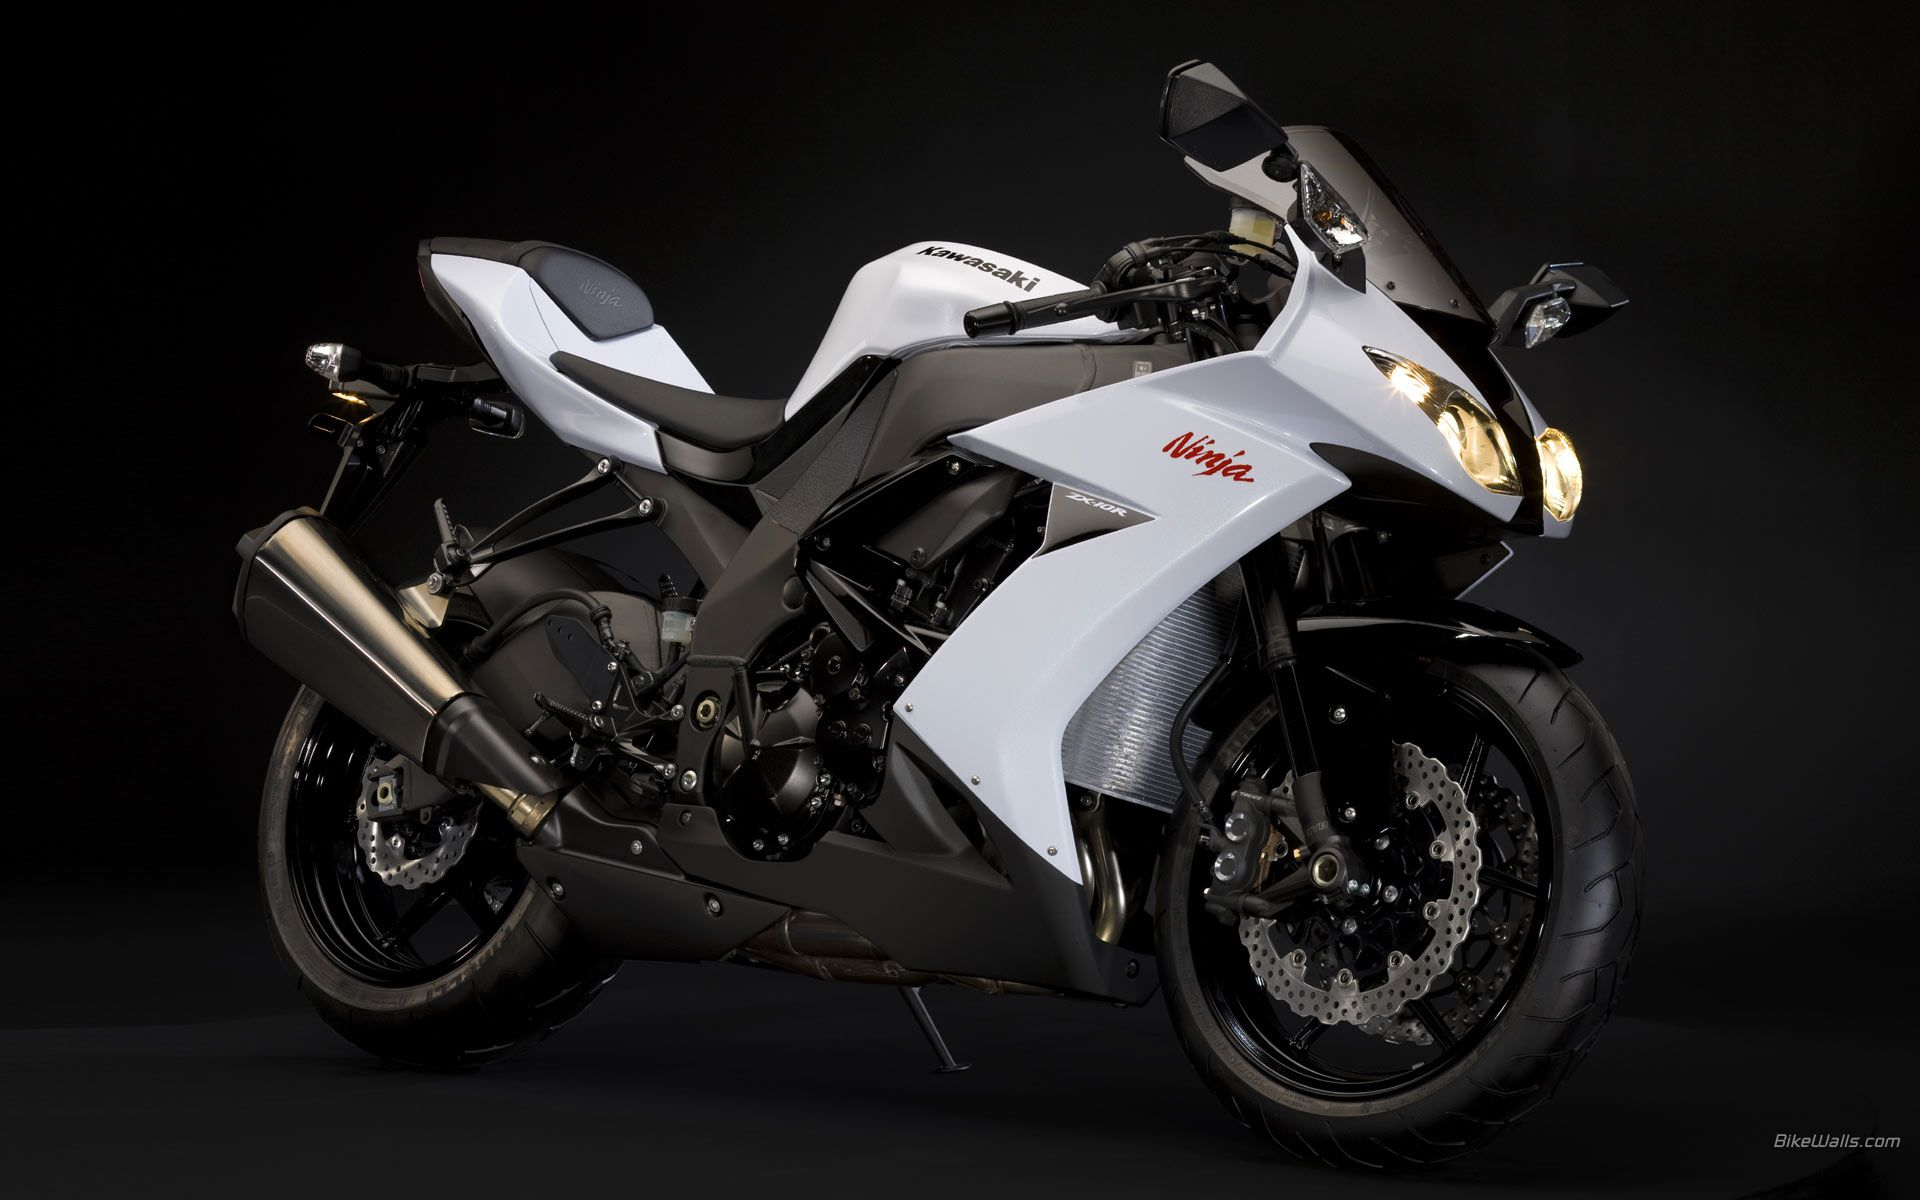 Kawasaki Ninja Zx 10r 2009 V